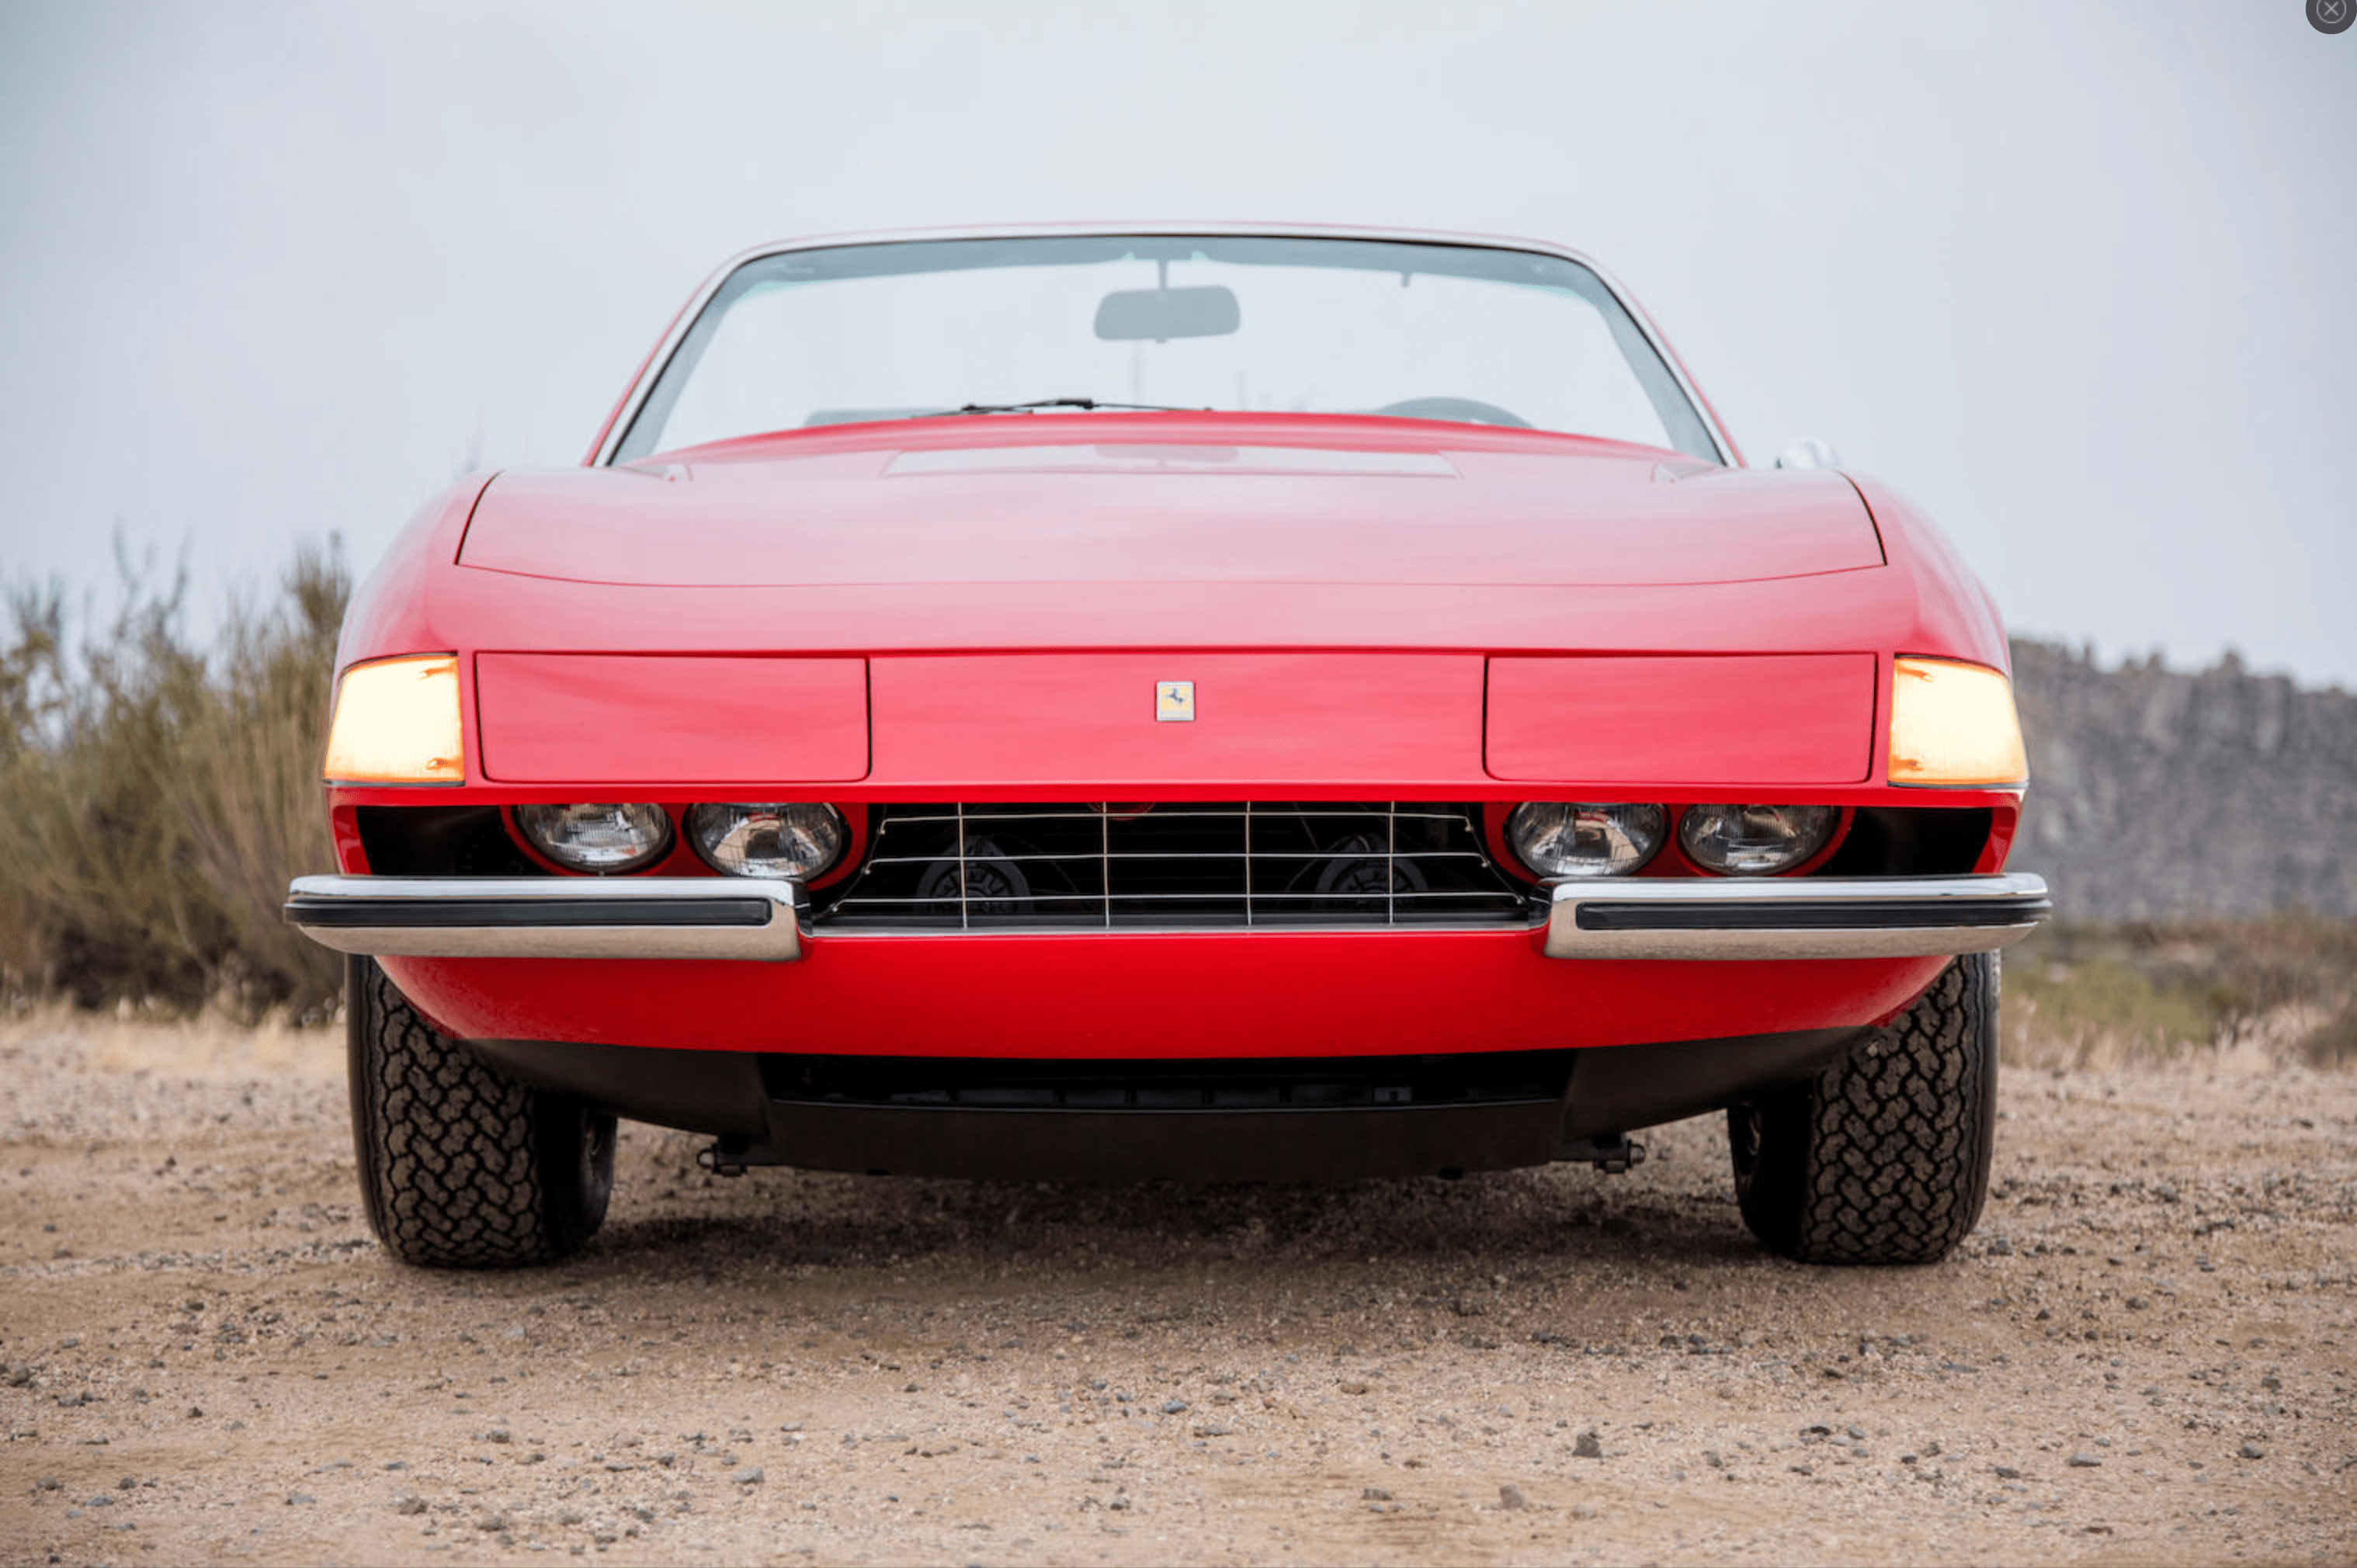 Vintage Ferrari Leasing